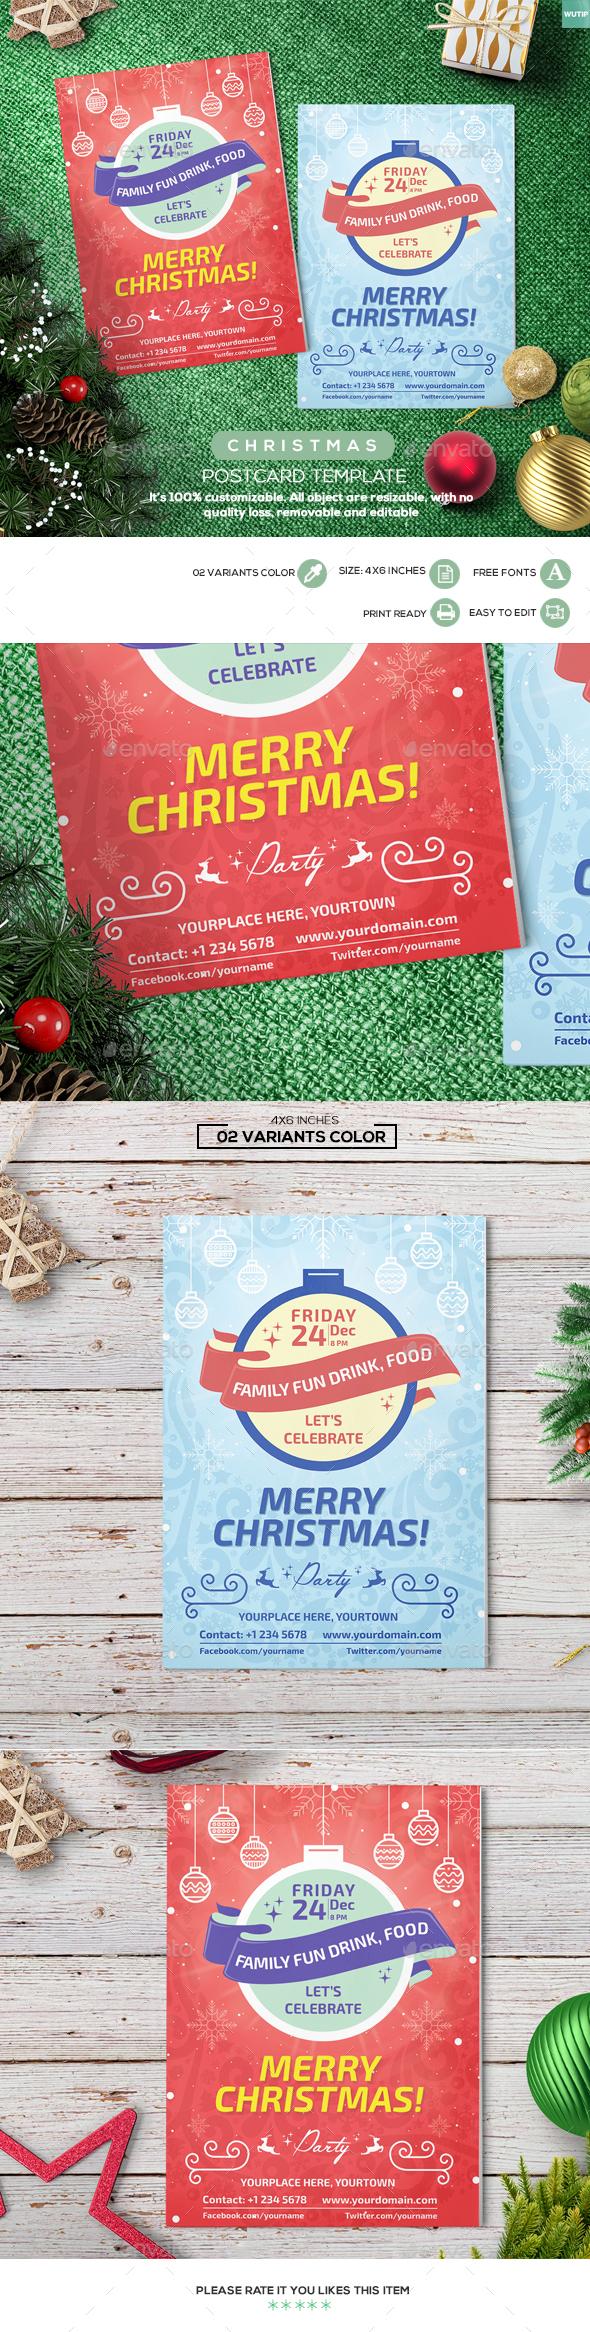 Christmas Postcard Template 01 - Holiday Greeting Cards